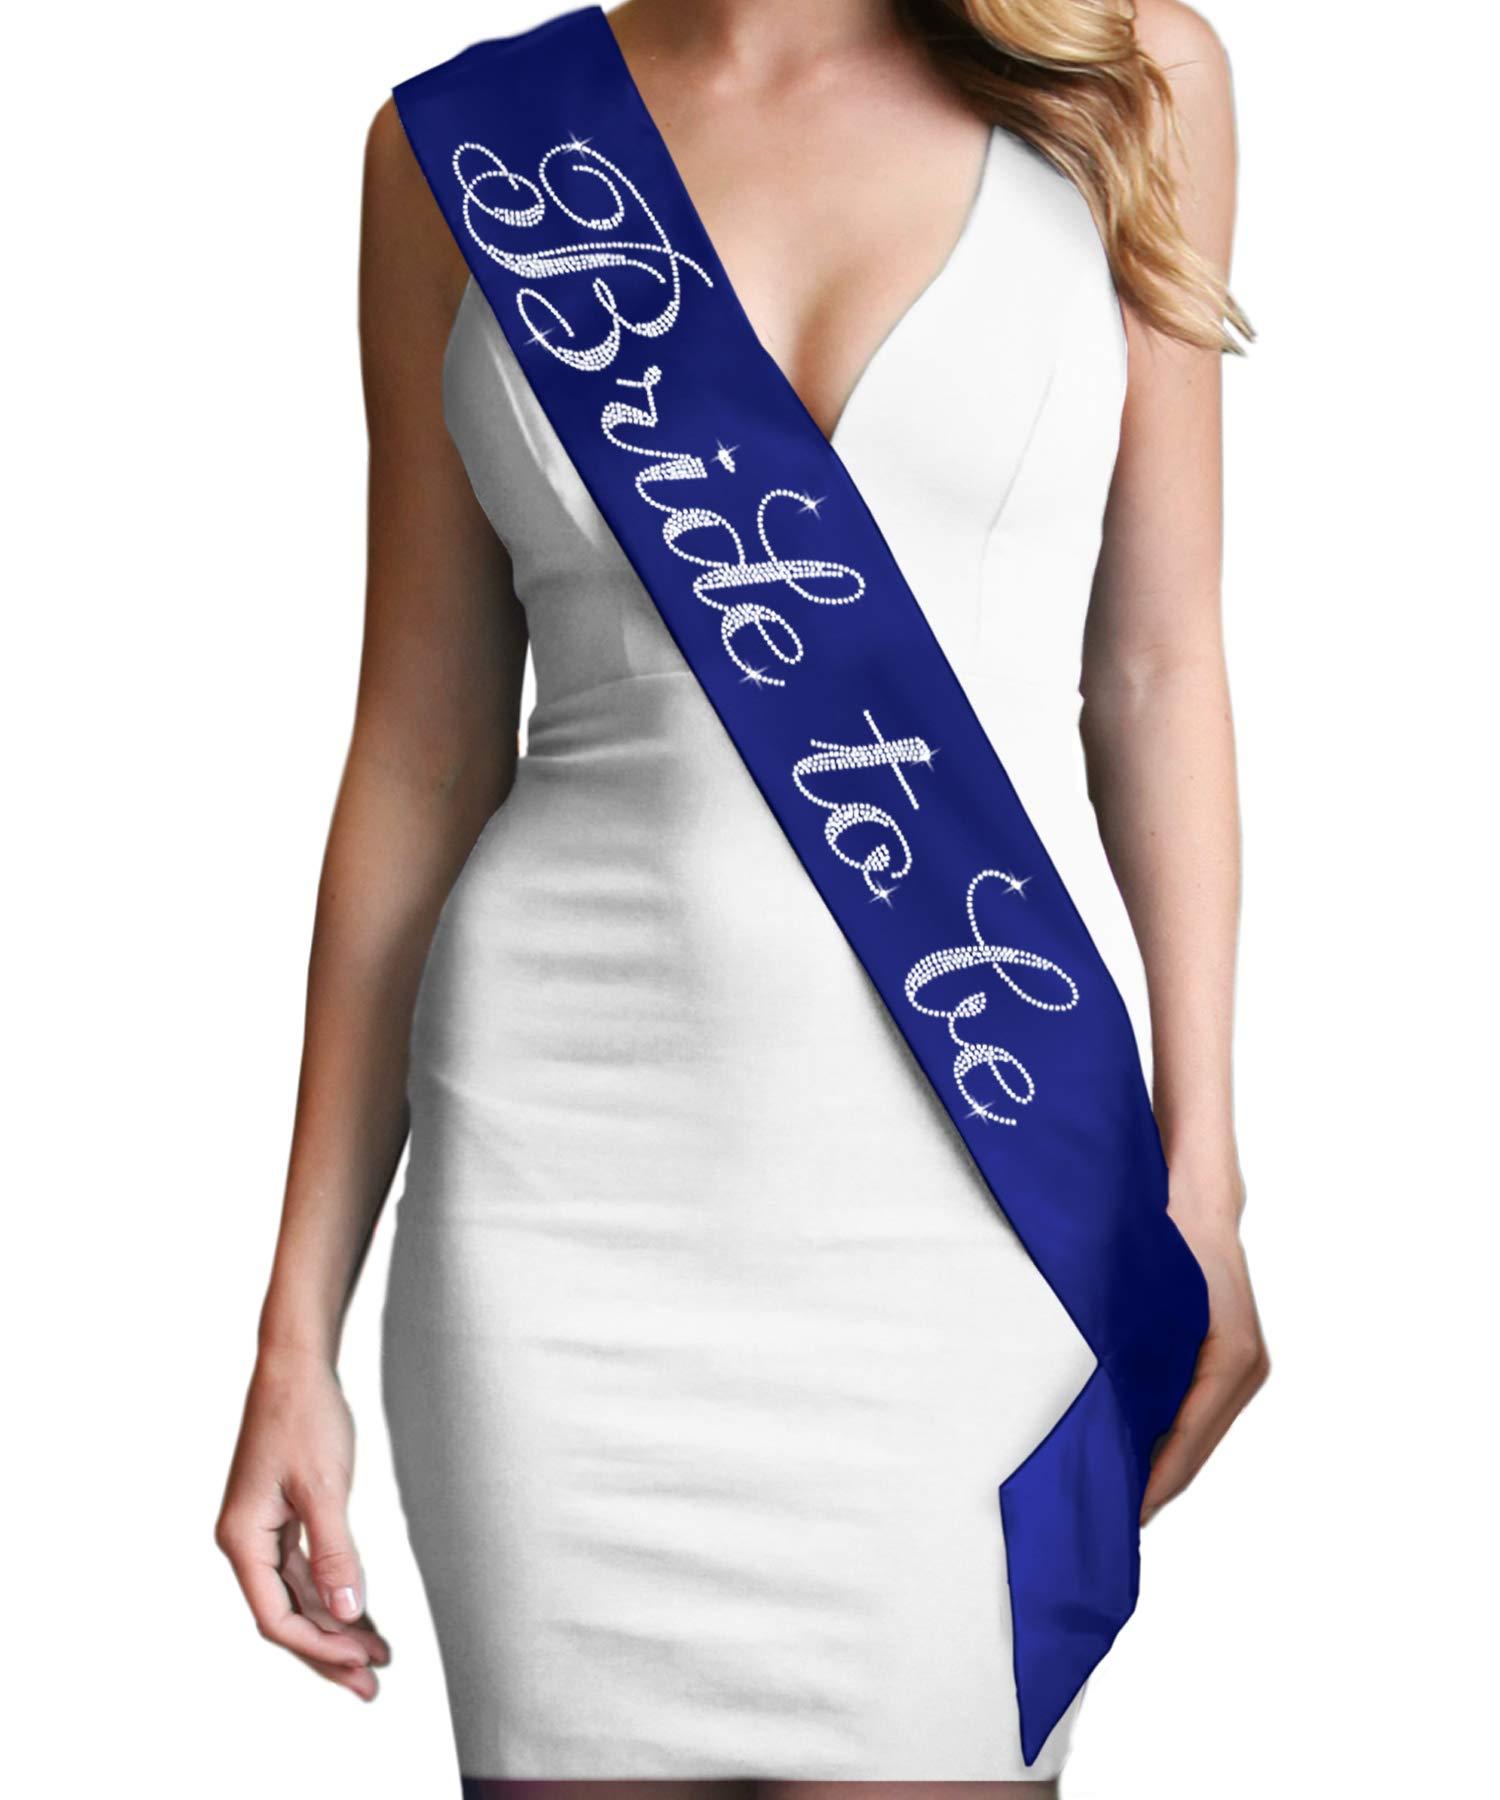 Navy Blue Bride Sash Nautical Bride to Be Flirty Rhinestone Satin Sash - Bridal Shower, Engagement & Bachelorette Decorations & Gifts Navy Blue Sash(FlrtB2B RS) NVY